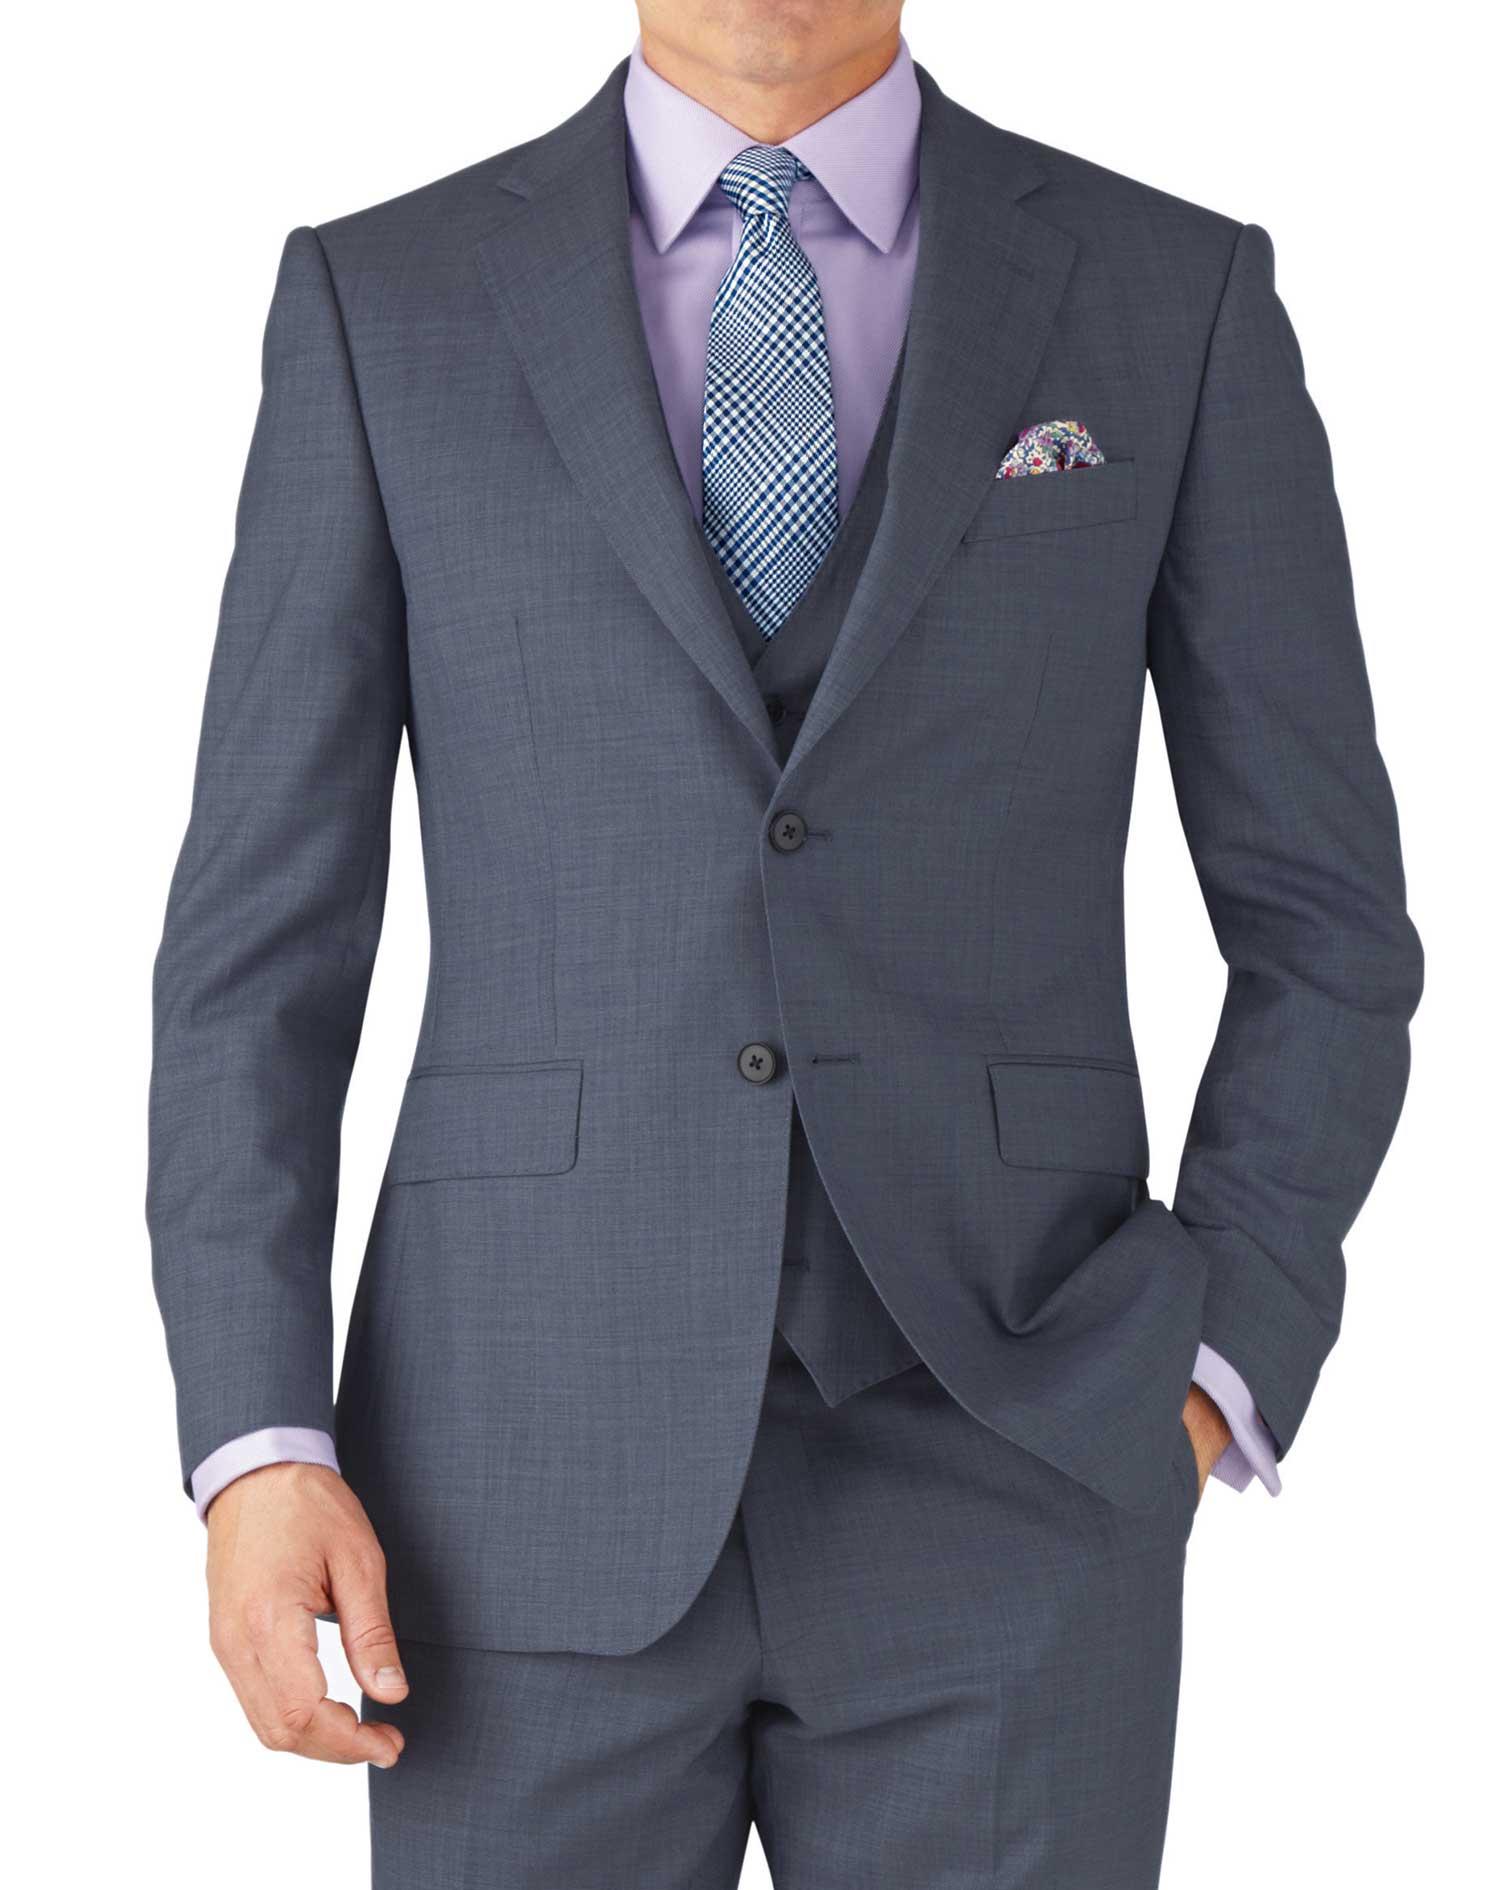 Light Blue Classic Fit Sharkskin Travel Suit Wool Jacket Size 48 Regular by Charles Tyrwhitt